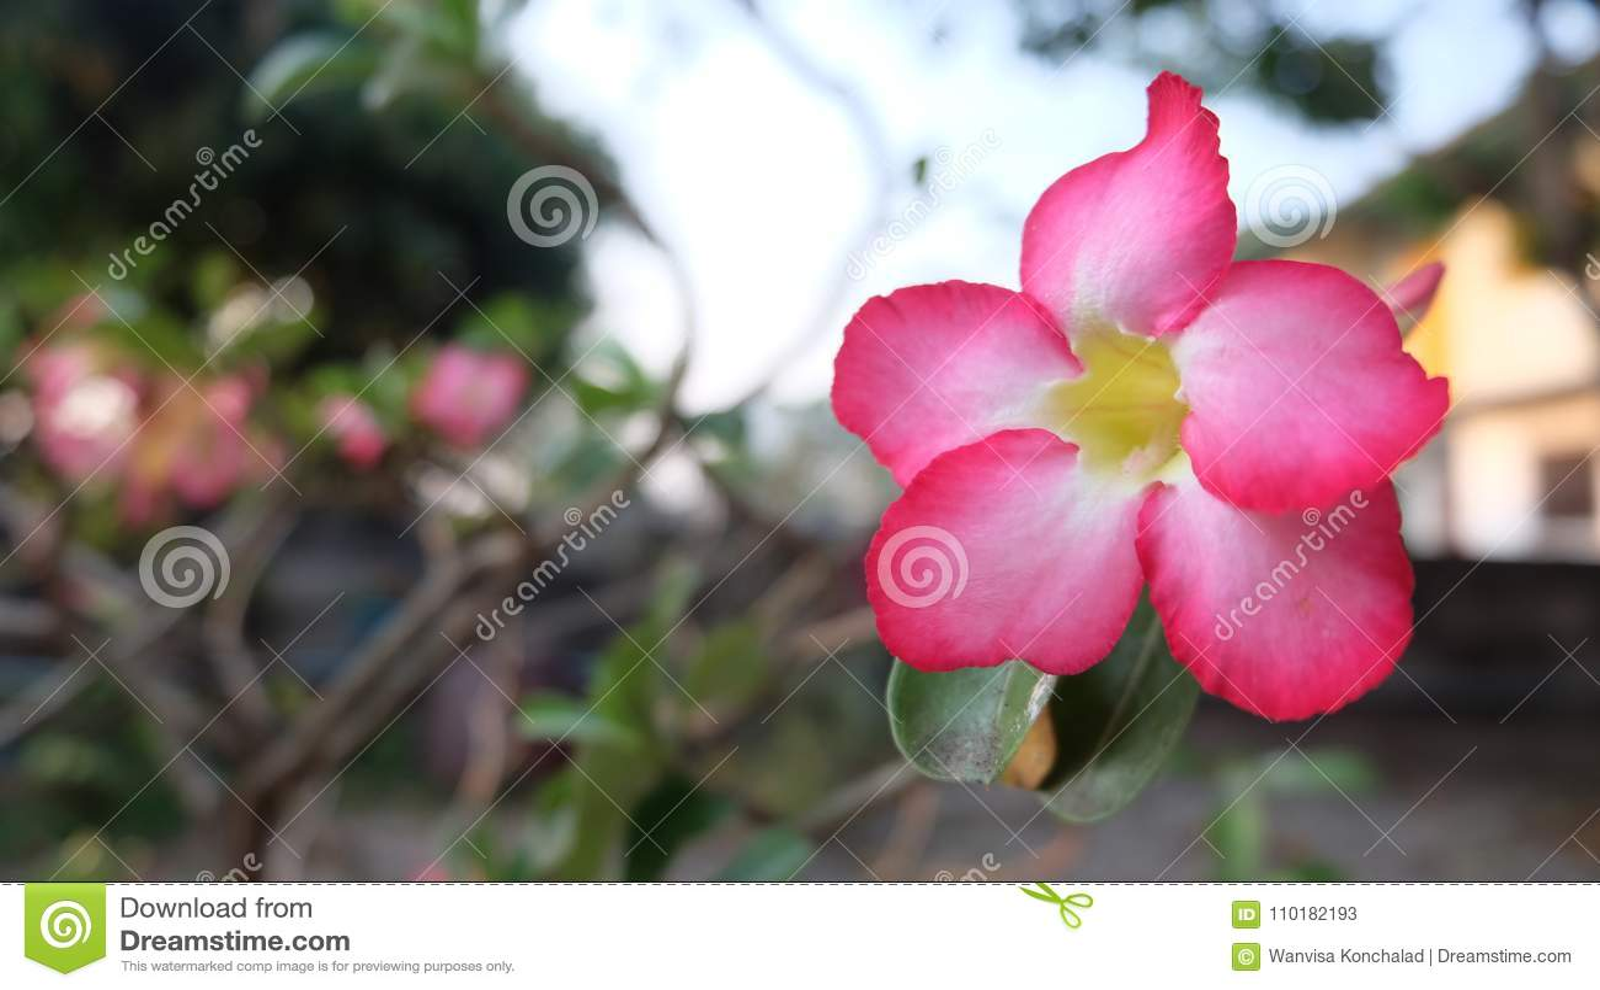 Impala lily it s very beautiful flower stock image image of impala lily it s very beautiful flower stock image image of impala home 110182193 izmirmasajfo